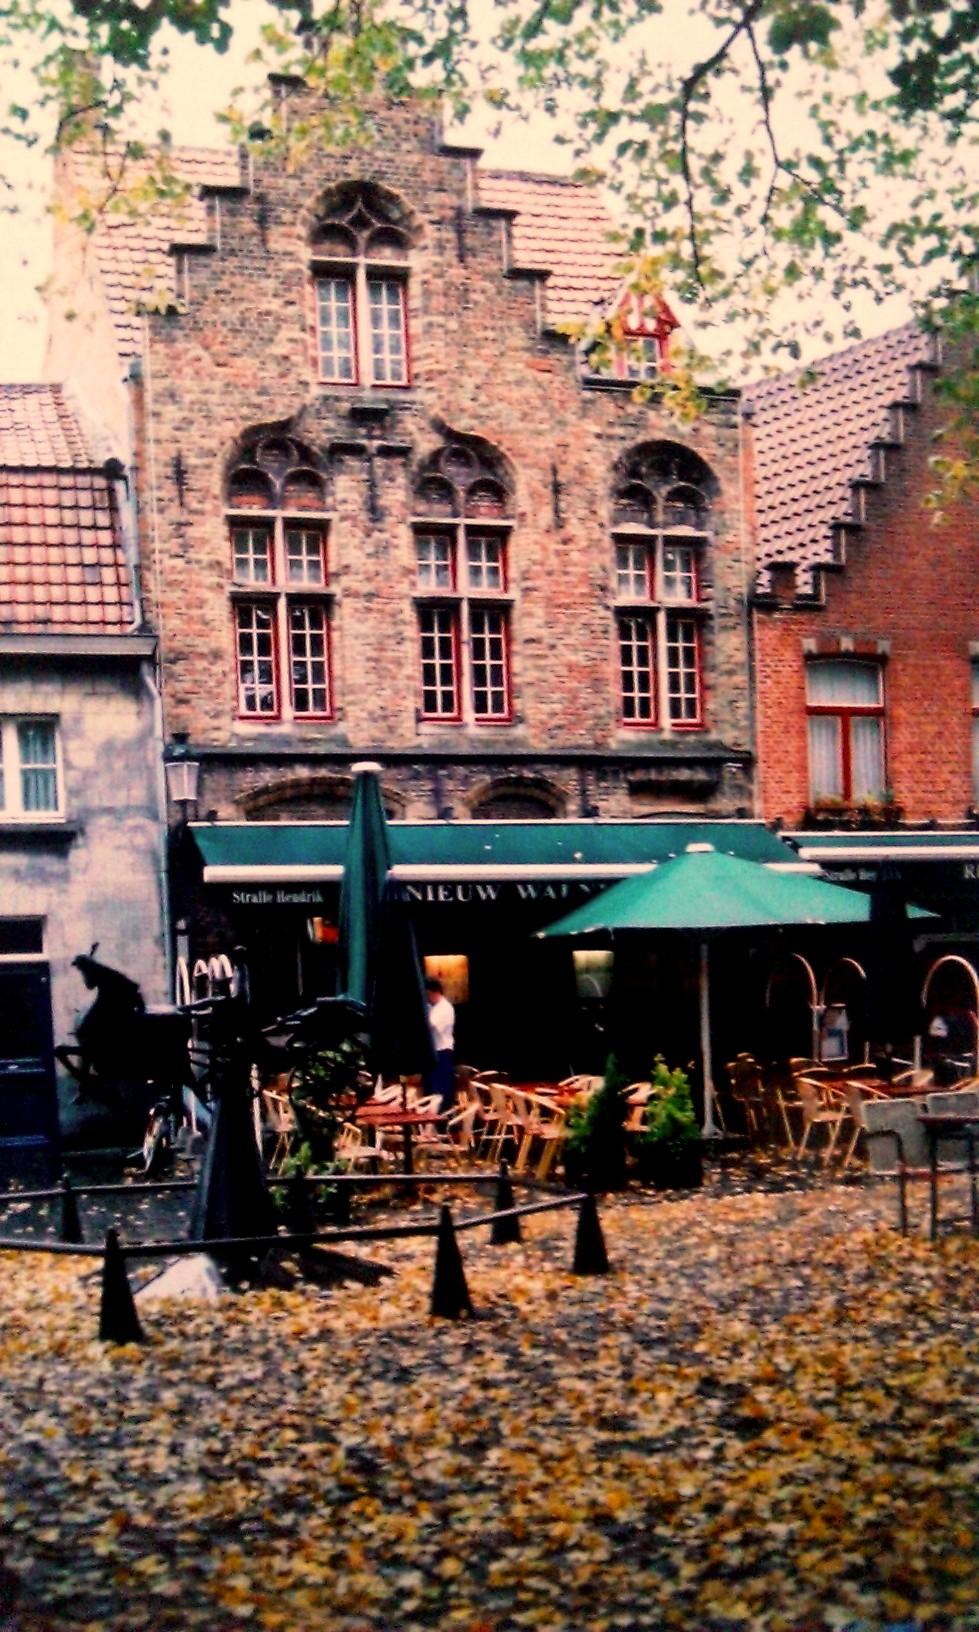 Historic Centre of Brugge - Belgium Cathrin Eszbach